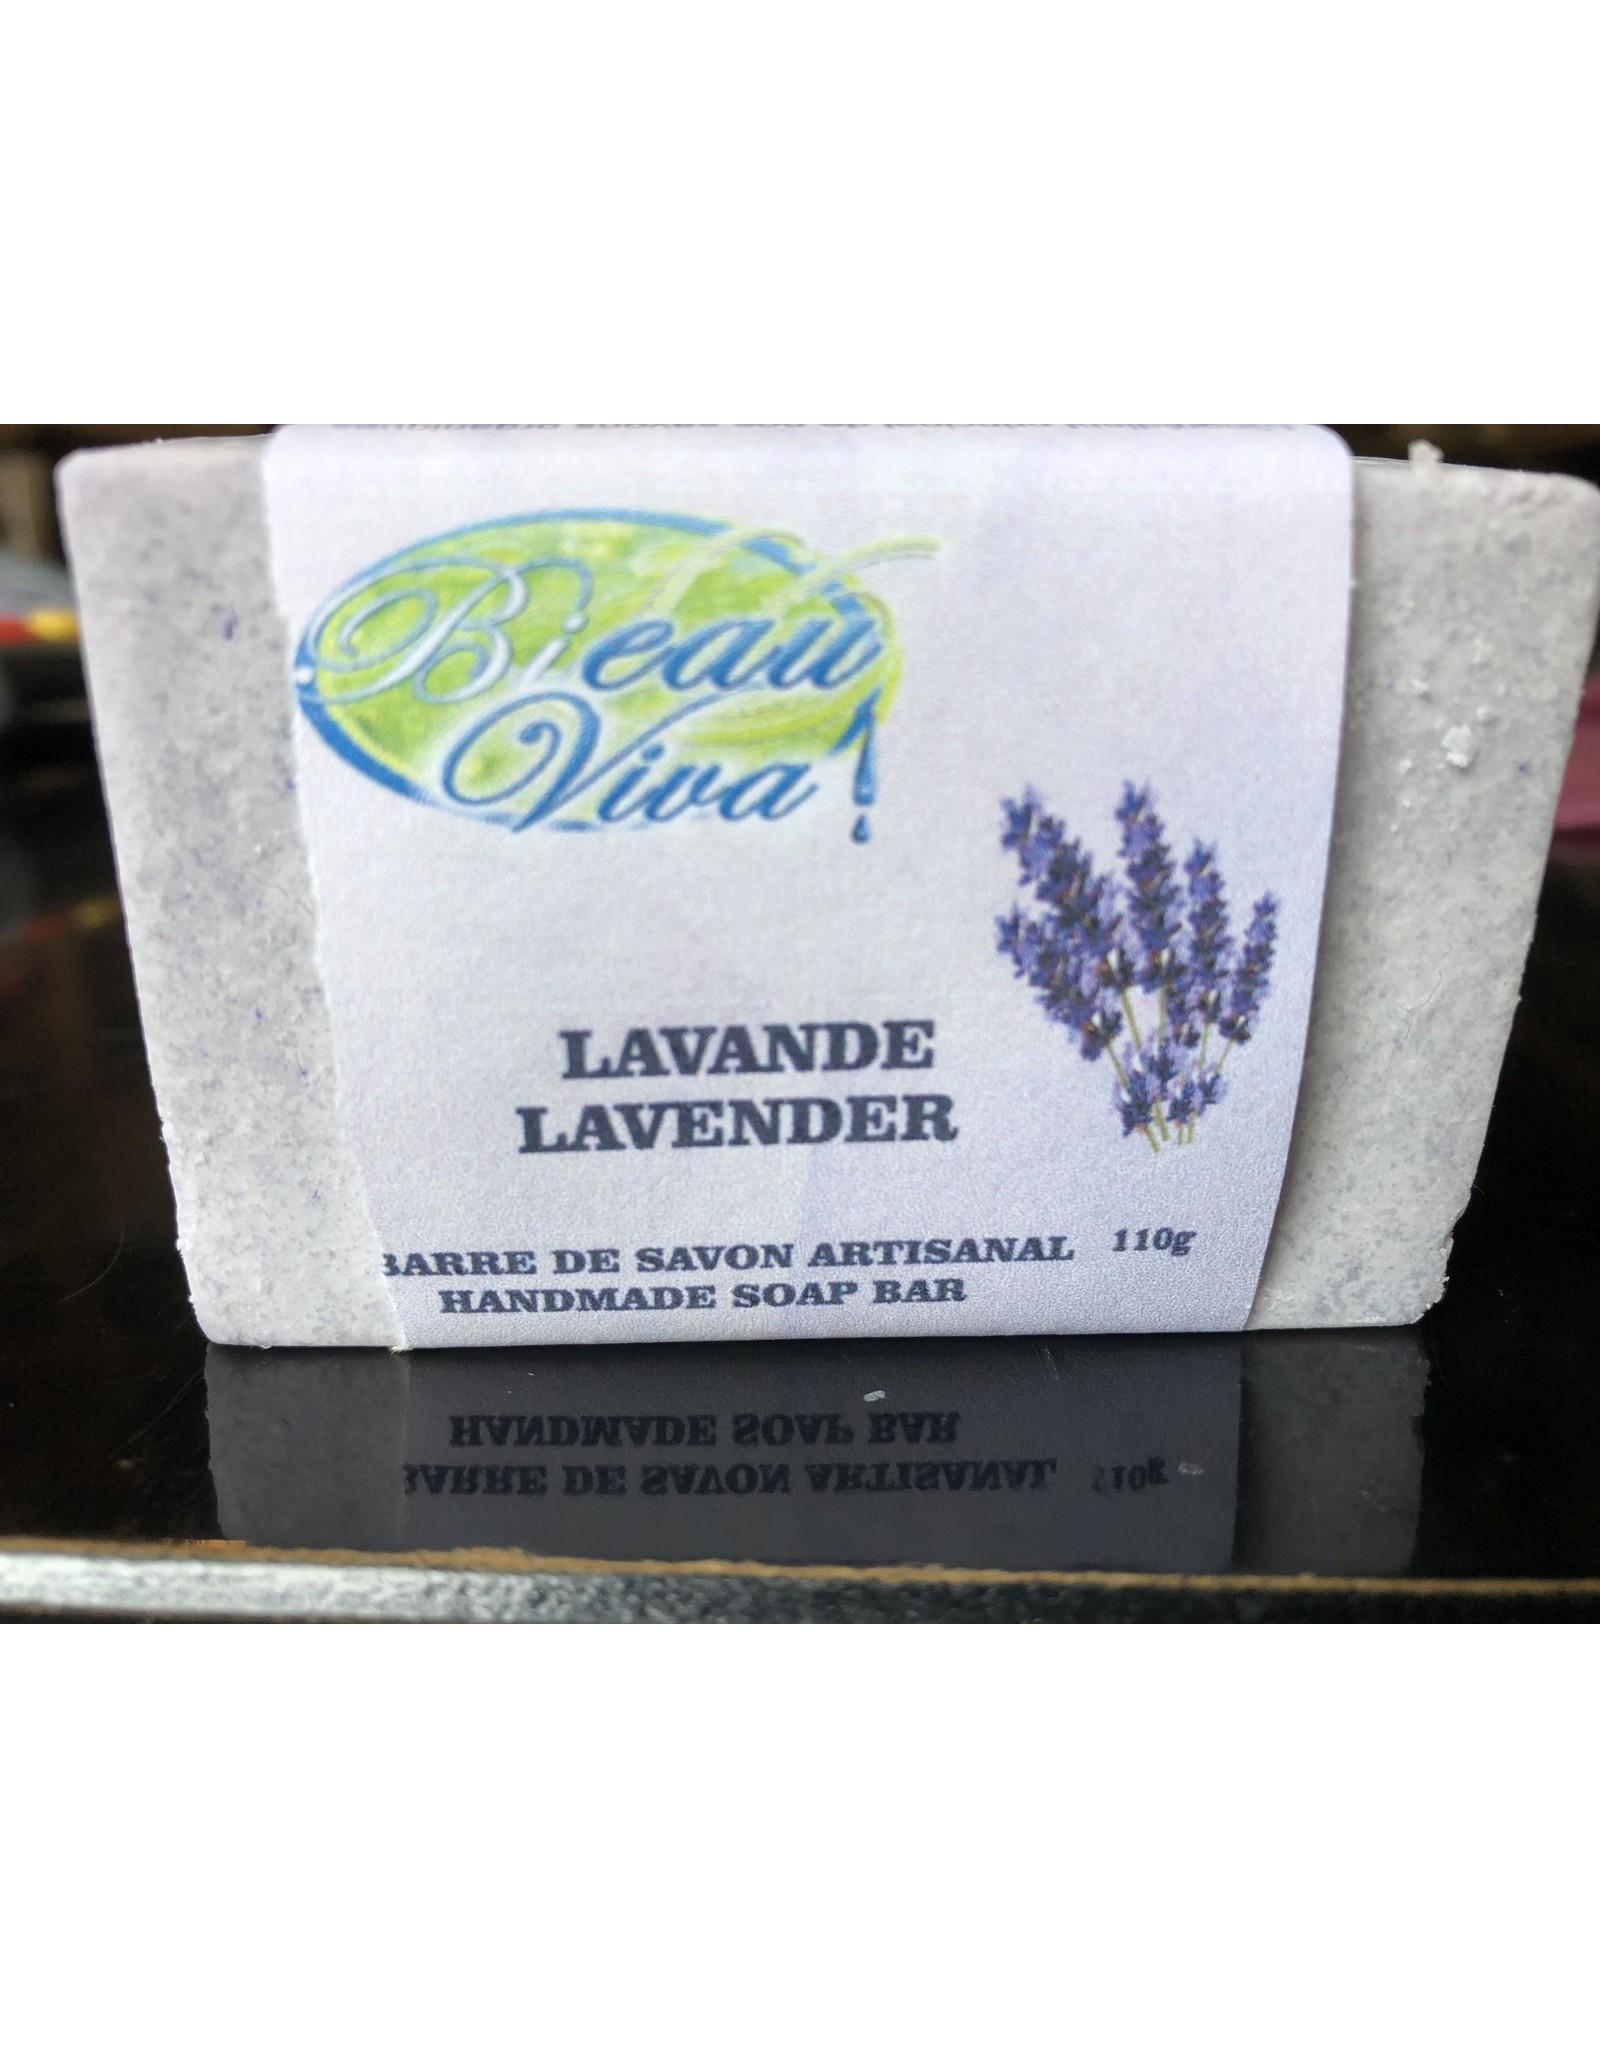 Bieau Viva Savon en barre, Lavande,110 gr